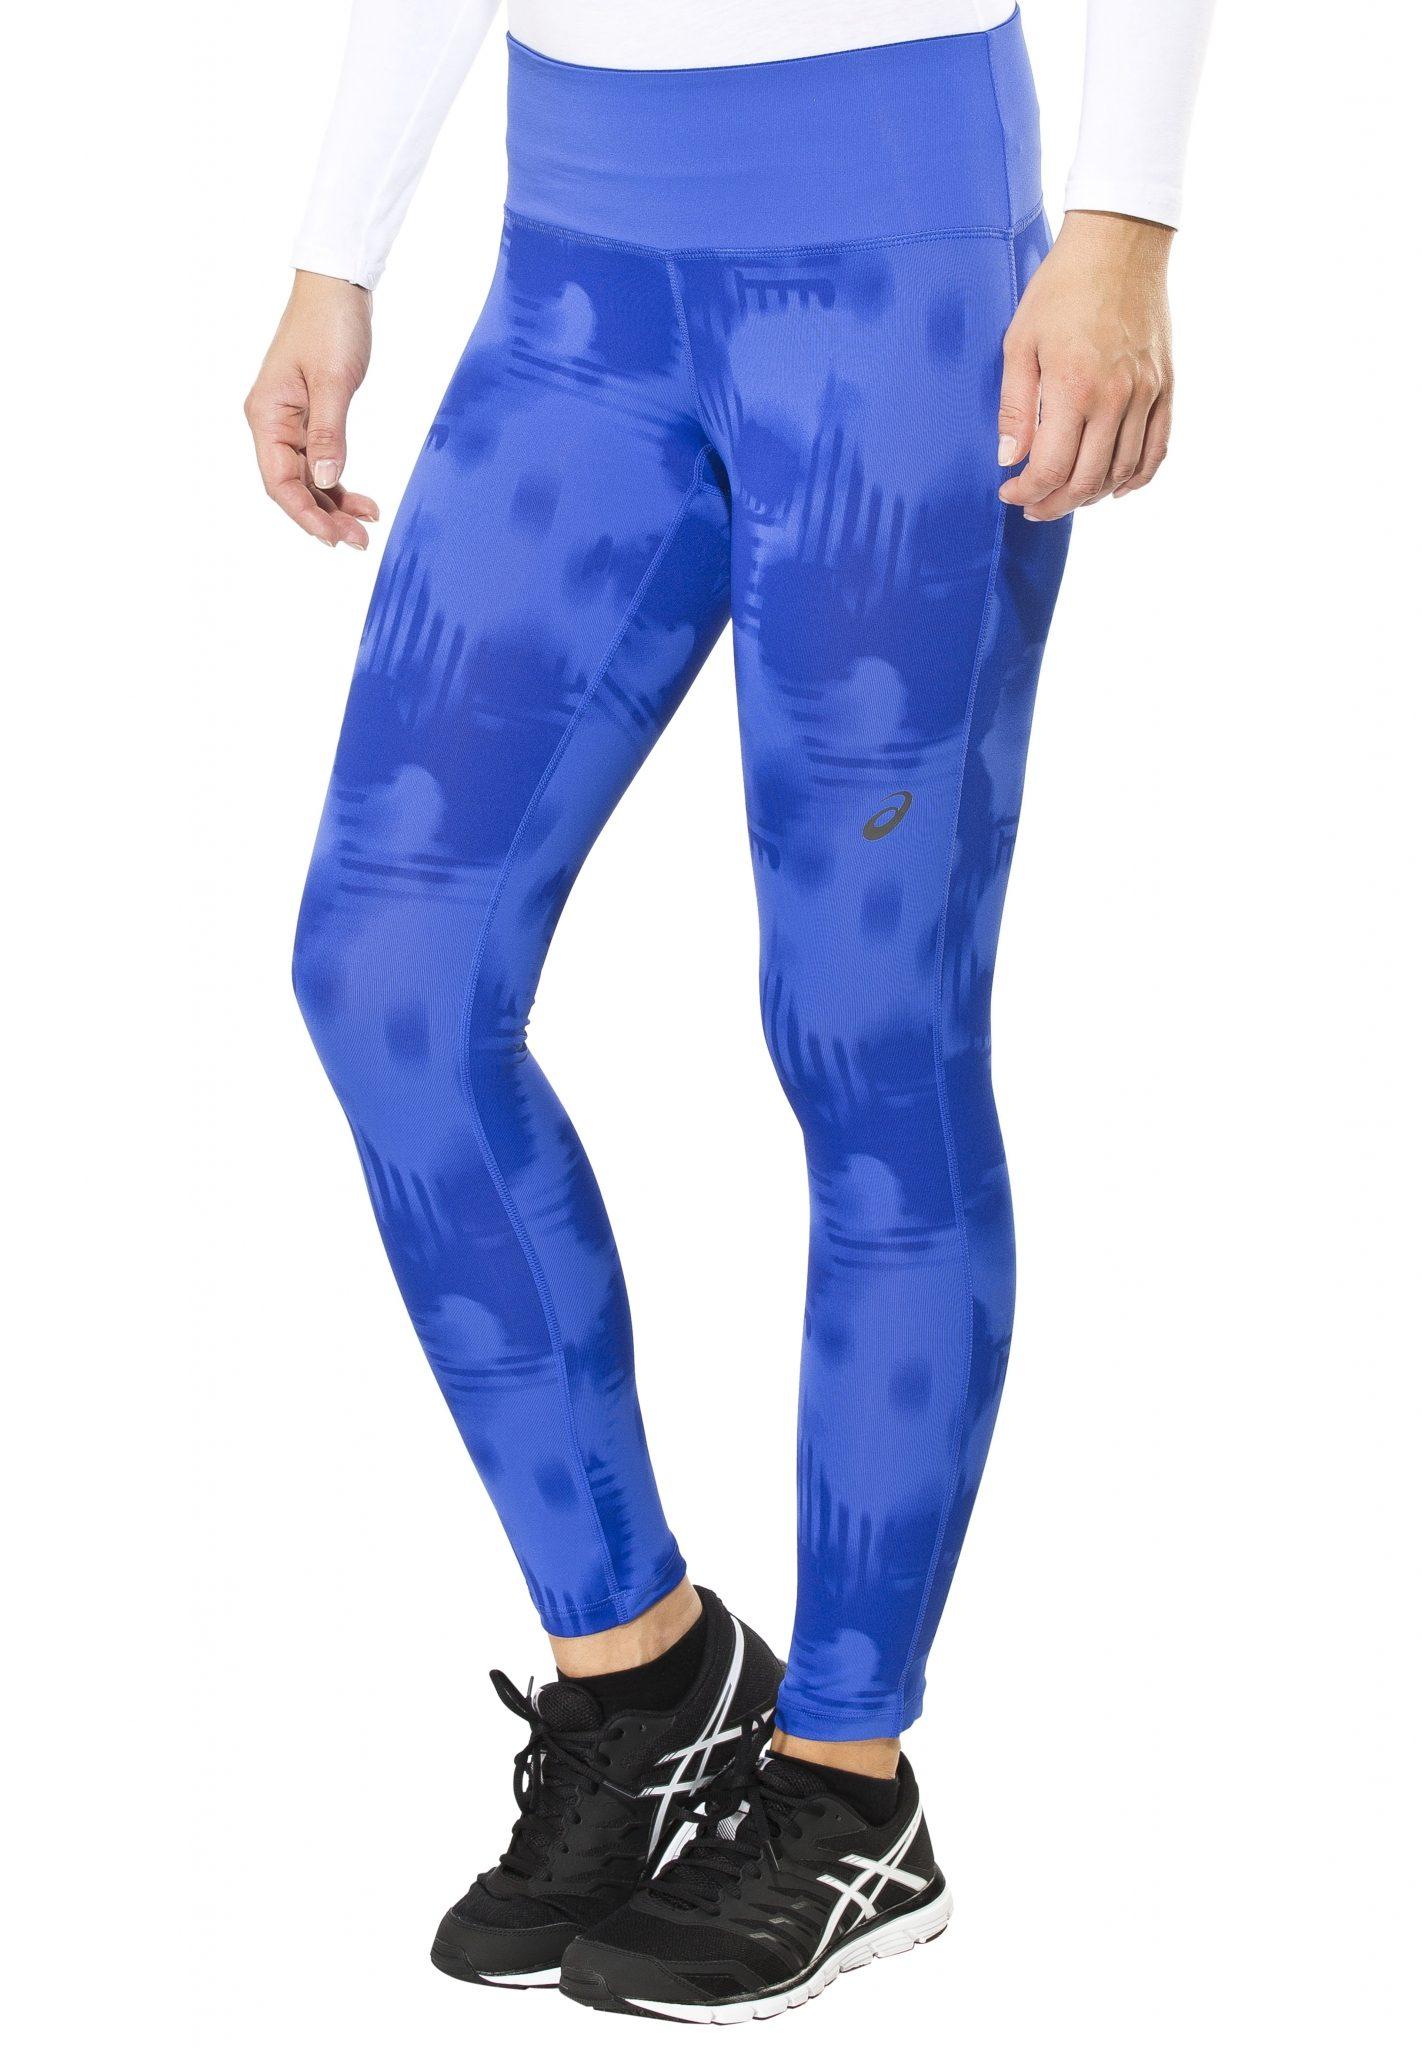 Asics Jogginghose »fuzeX 7/8 Tight Women«